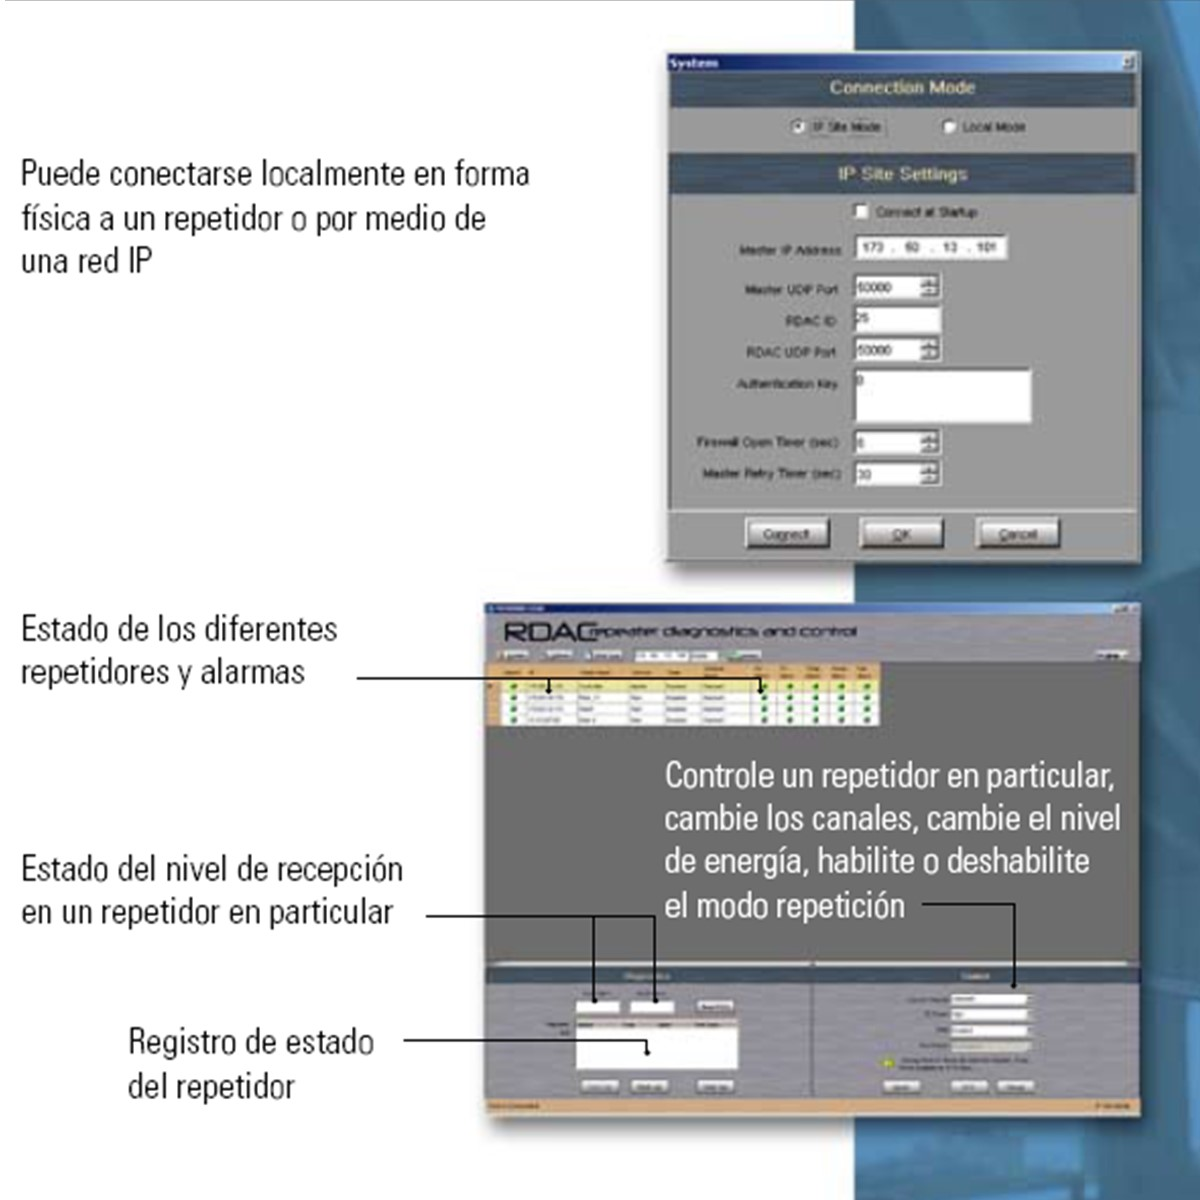 Licencia Motorola RDAC Multiple System HKVN4040 para Repetidora